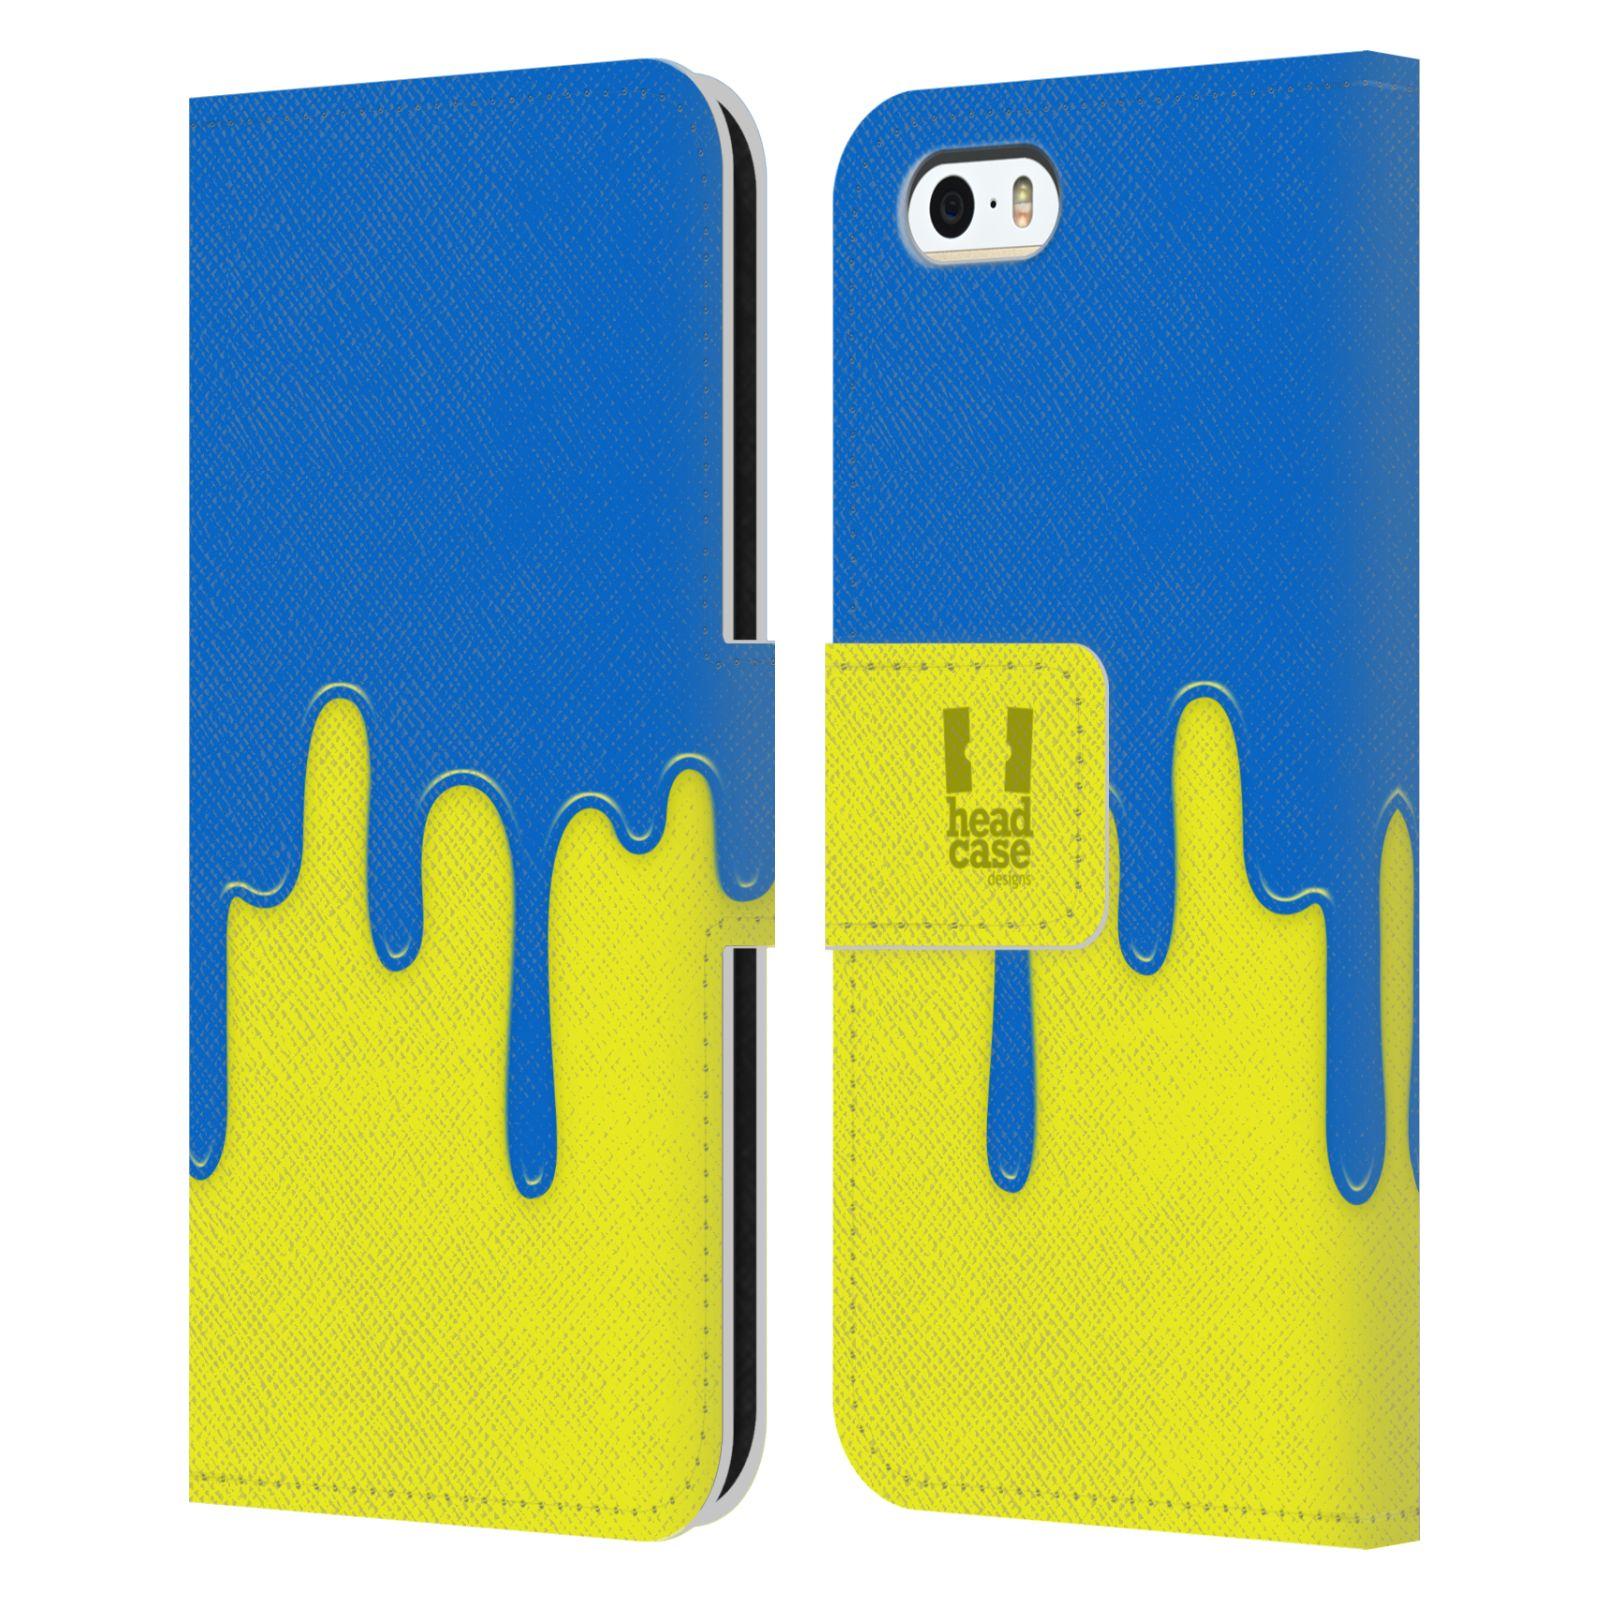 HEAD CASE Flipové pouzdro pro mobil Apple Iphone 5/5s Rozlitá barva modrá a žlutá